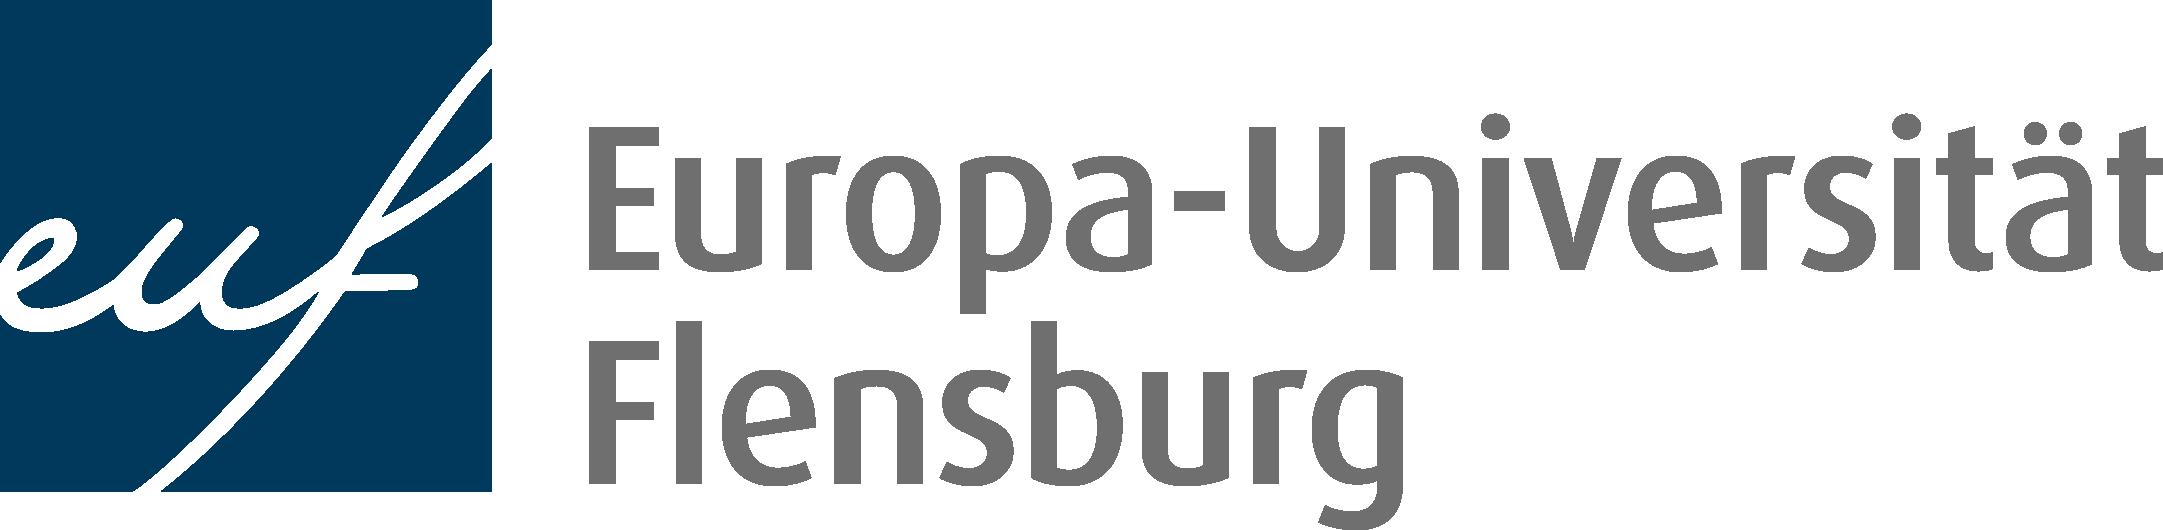 Europa Universität Flensburg